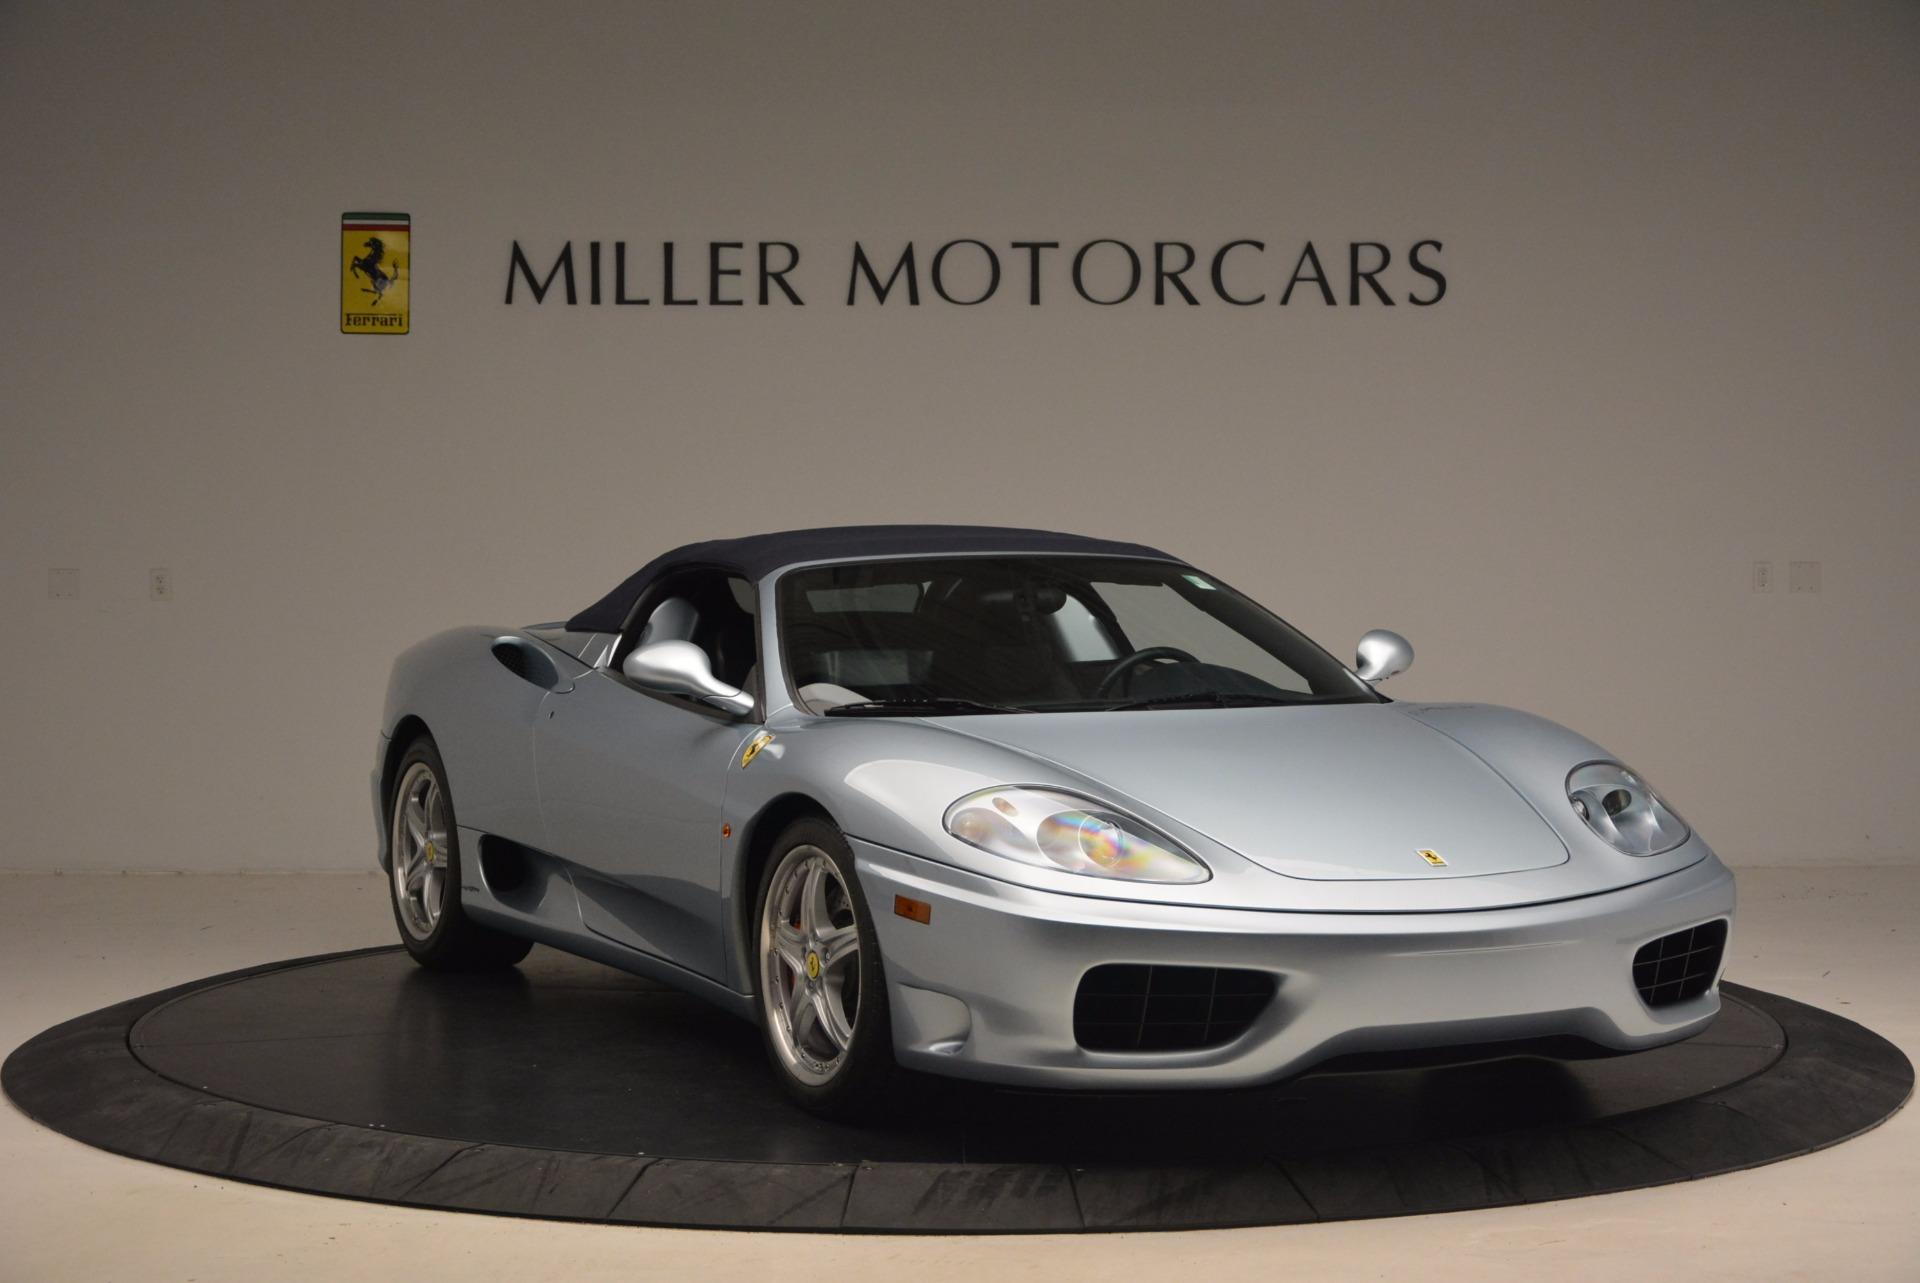 Used 2003 Ferrari 360 Spider 6-Speed Manual For Sale In Westport, CT 1445_p23